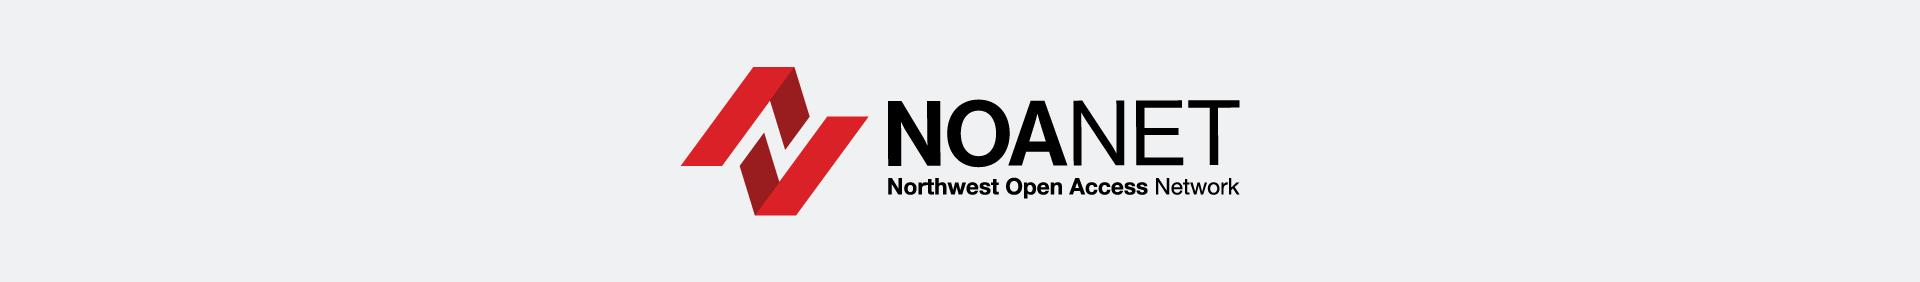 NoaNet - Washington Fiber Broadband Solutions